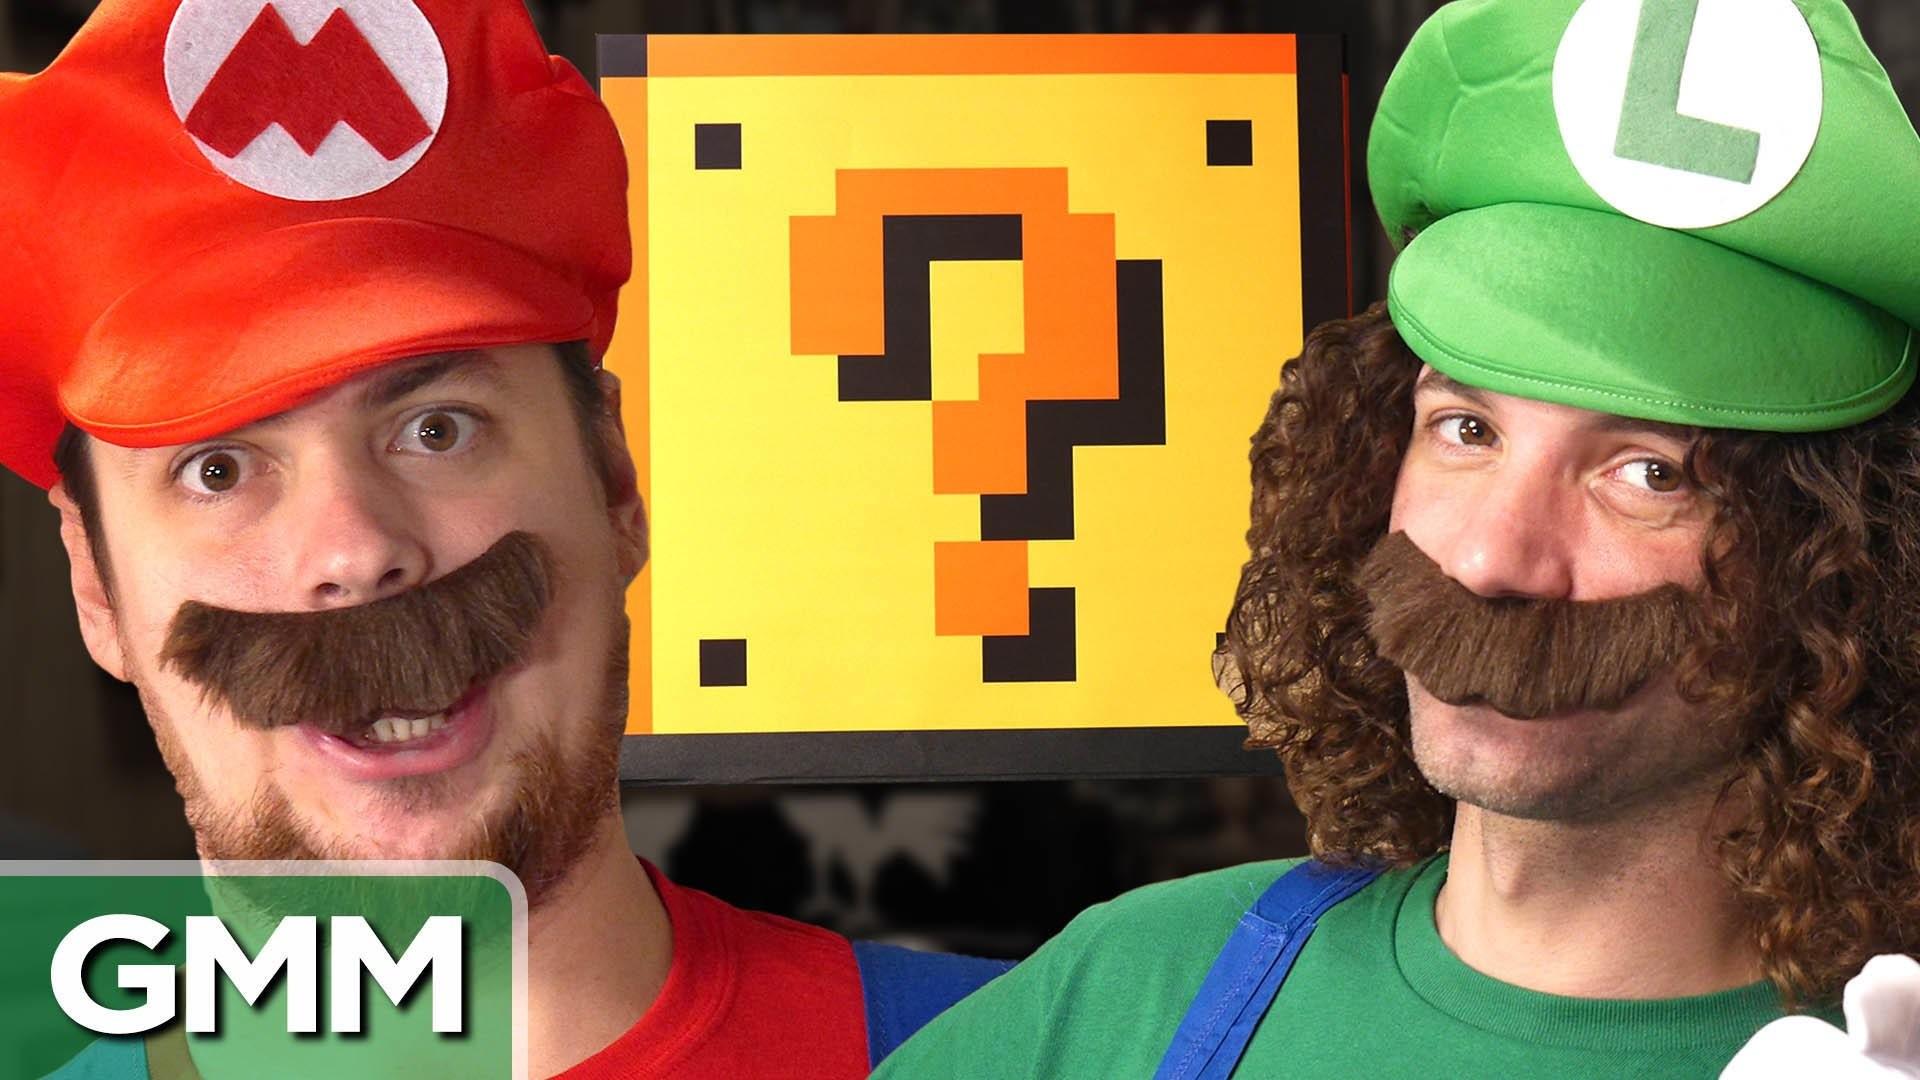 "Rhett & Link on Twitter: ""Today: Dan & Arin from @GameGrumps transform into  Mario & Luigi! #GMS https://t.co/7lt5cHcdG1 https://t.co/1geWBaHZGi"""